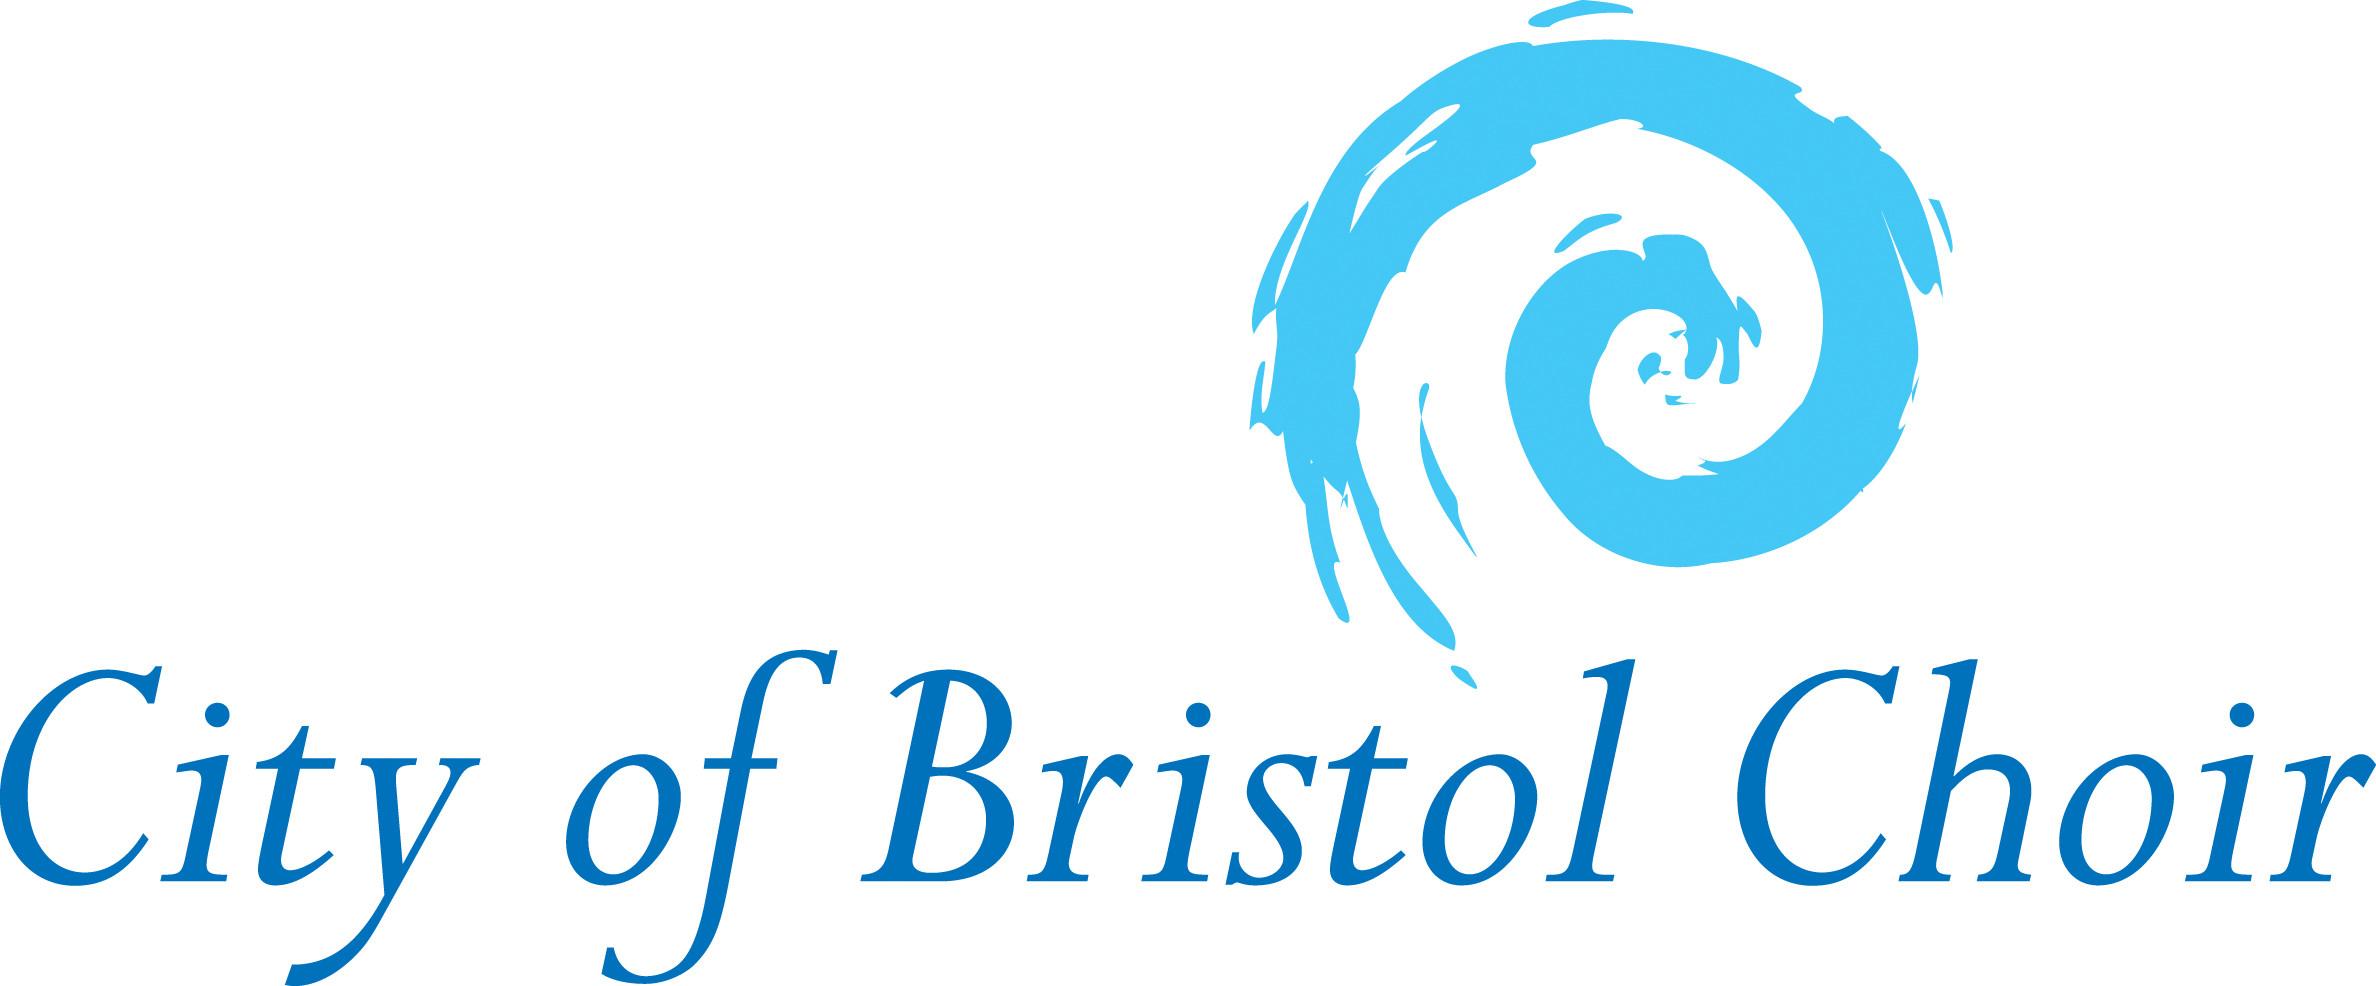 City of Bristol Choir